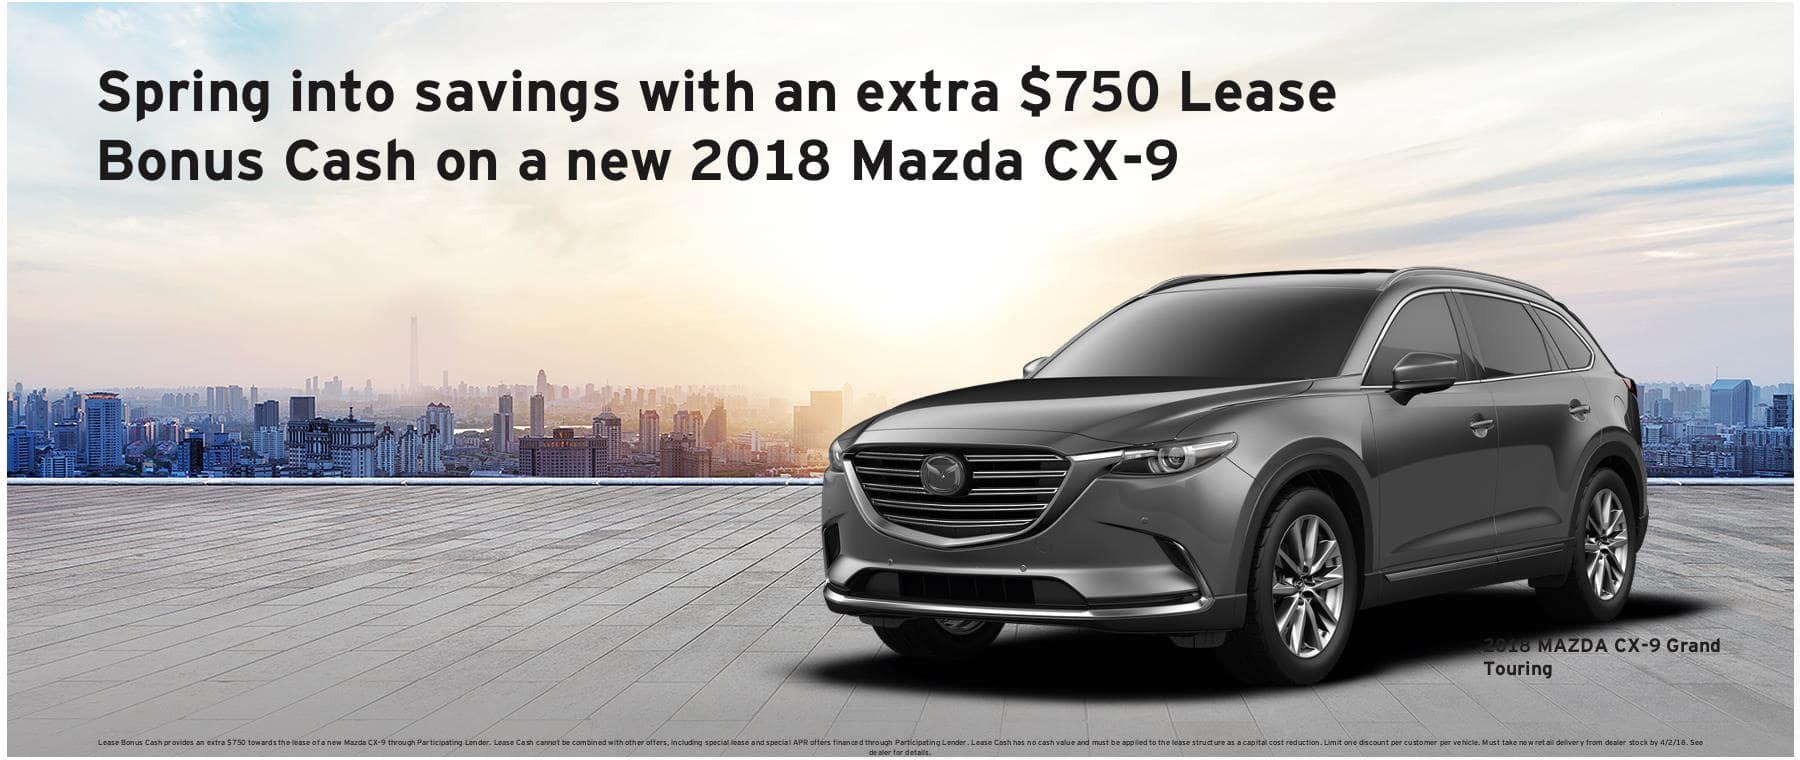 Garden City Mazda Mazda Dealer In Hempstead NY - Mazda dealership ny